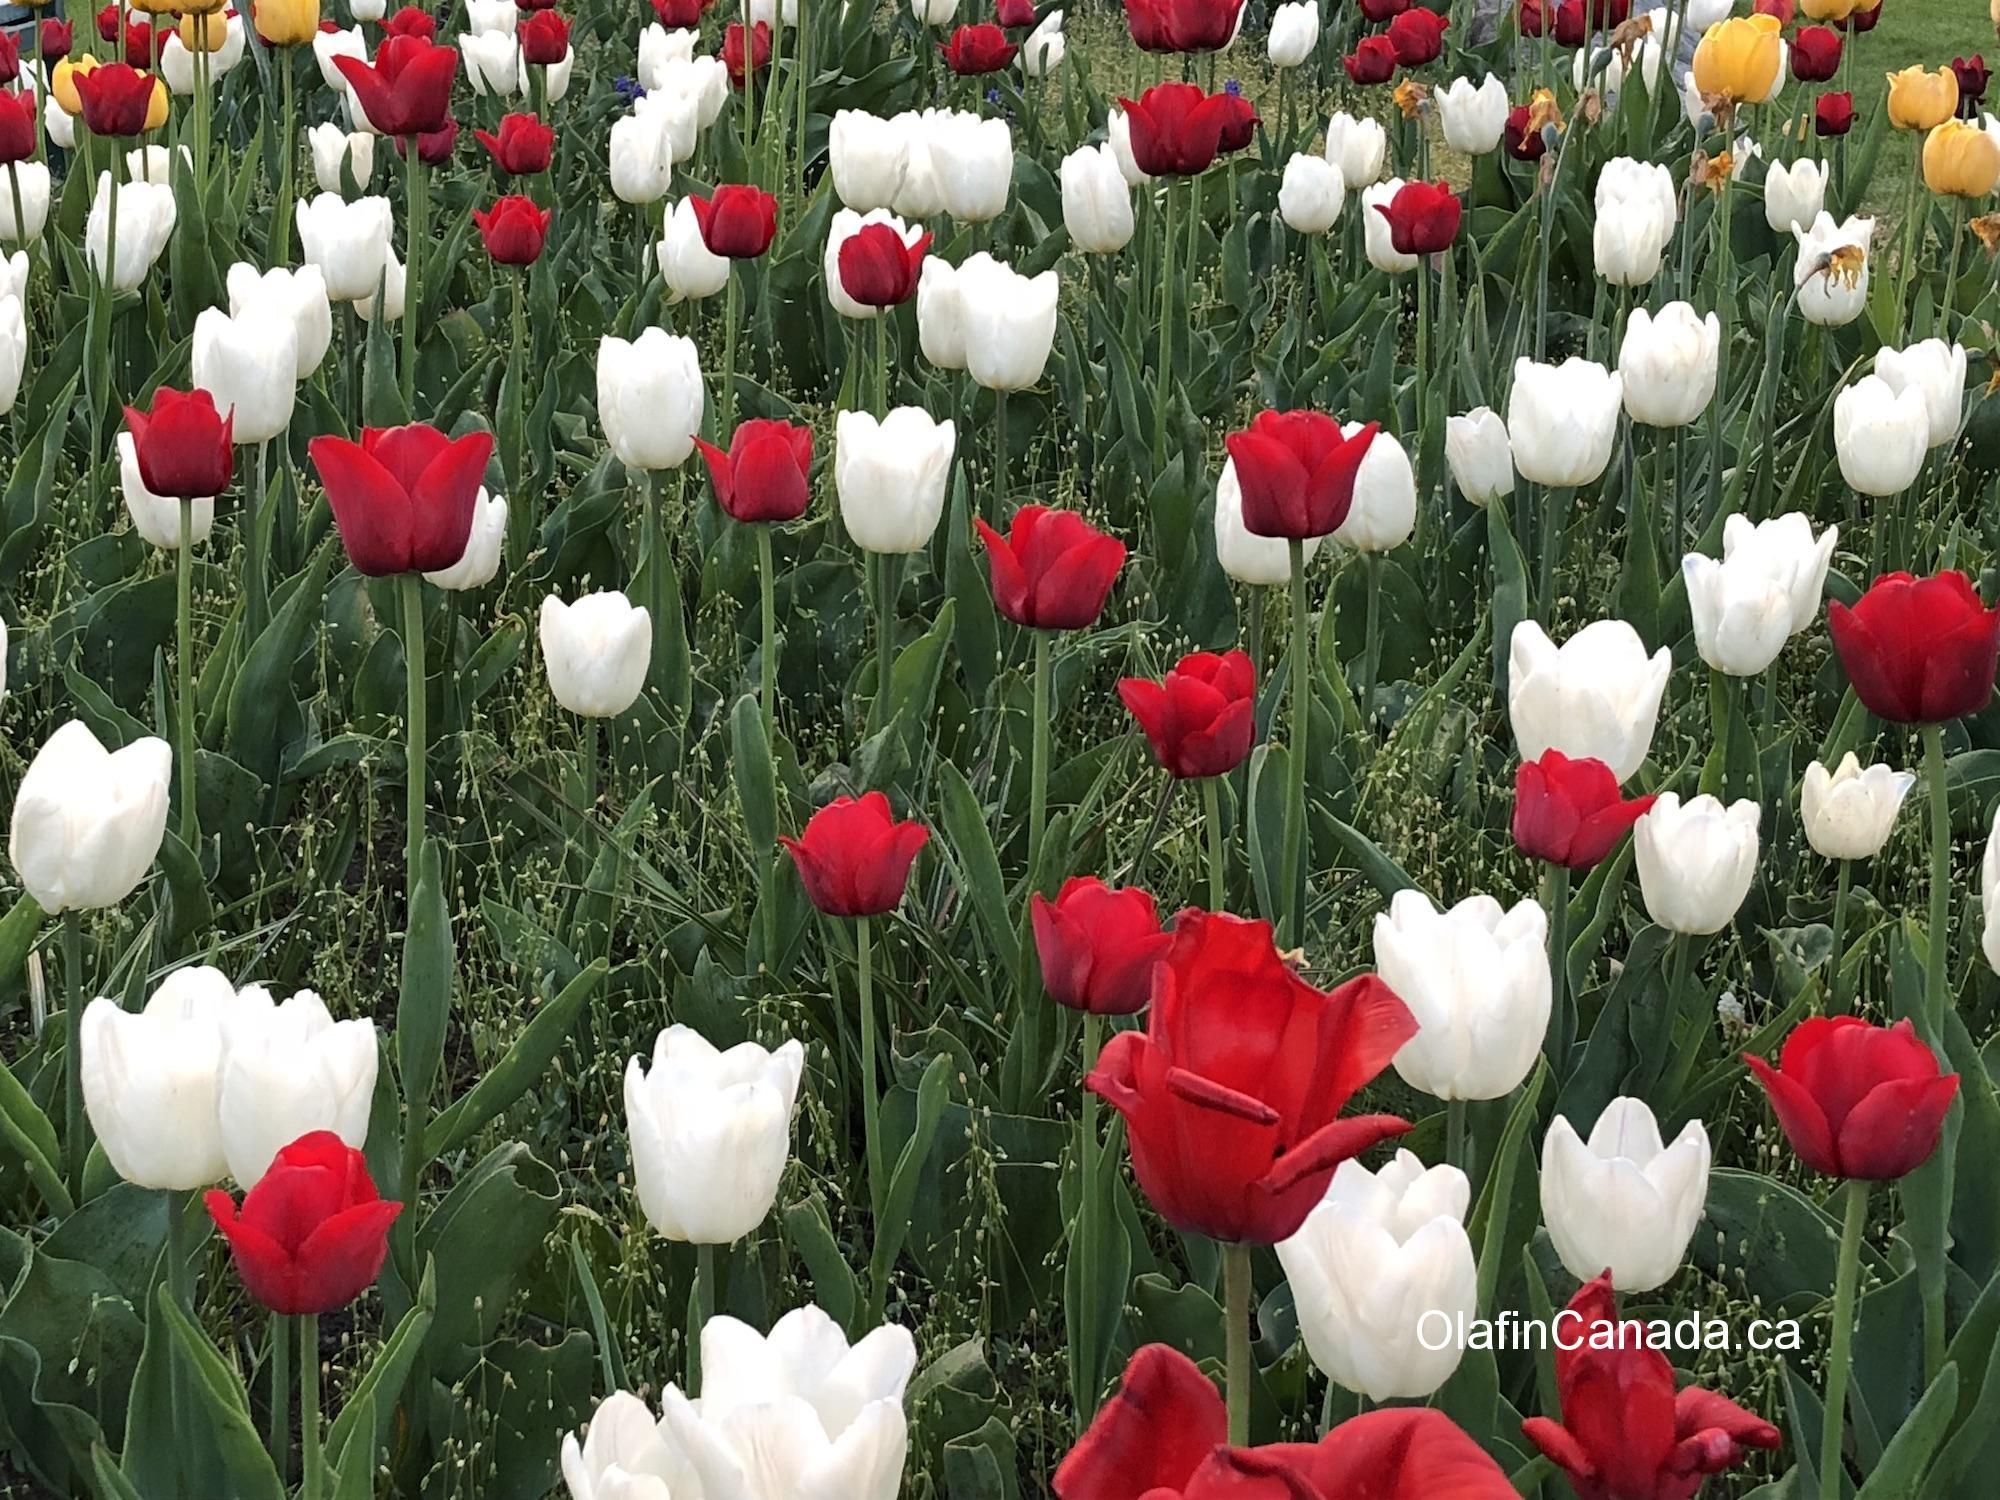 Tulips in Peachland #olafincanada #britishcolumbia #discoverbc #peachland #tulips